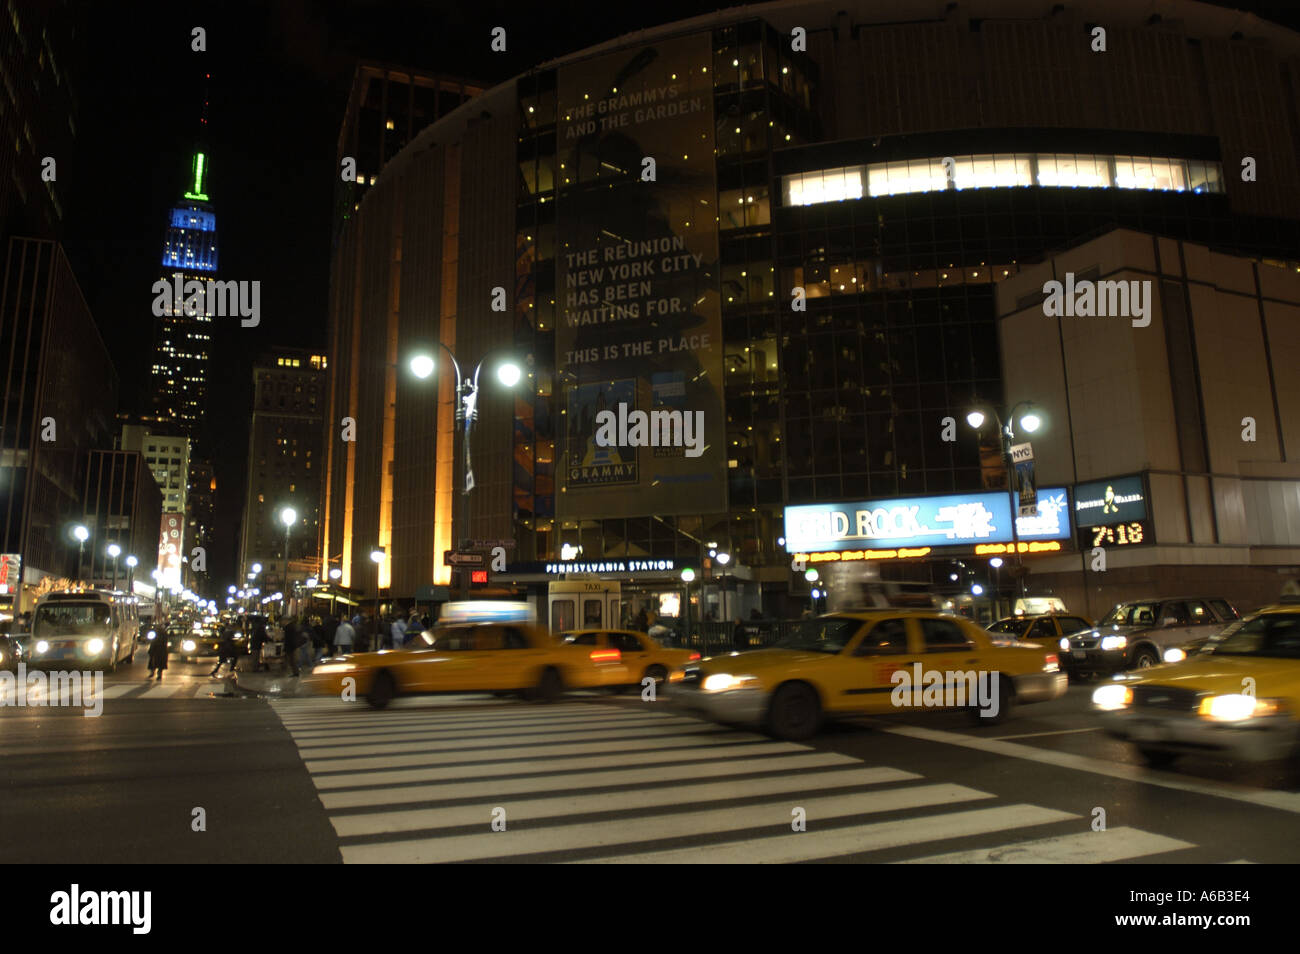 Madison Square Garden Events Stock Photos & Madison Square Garden ...